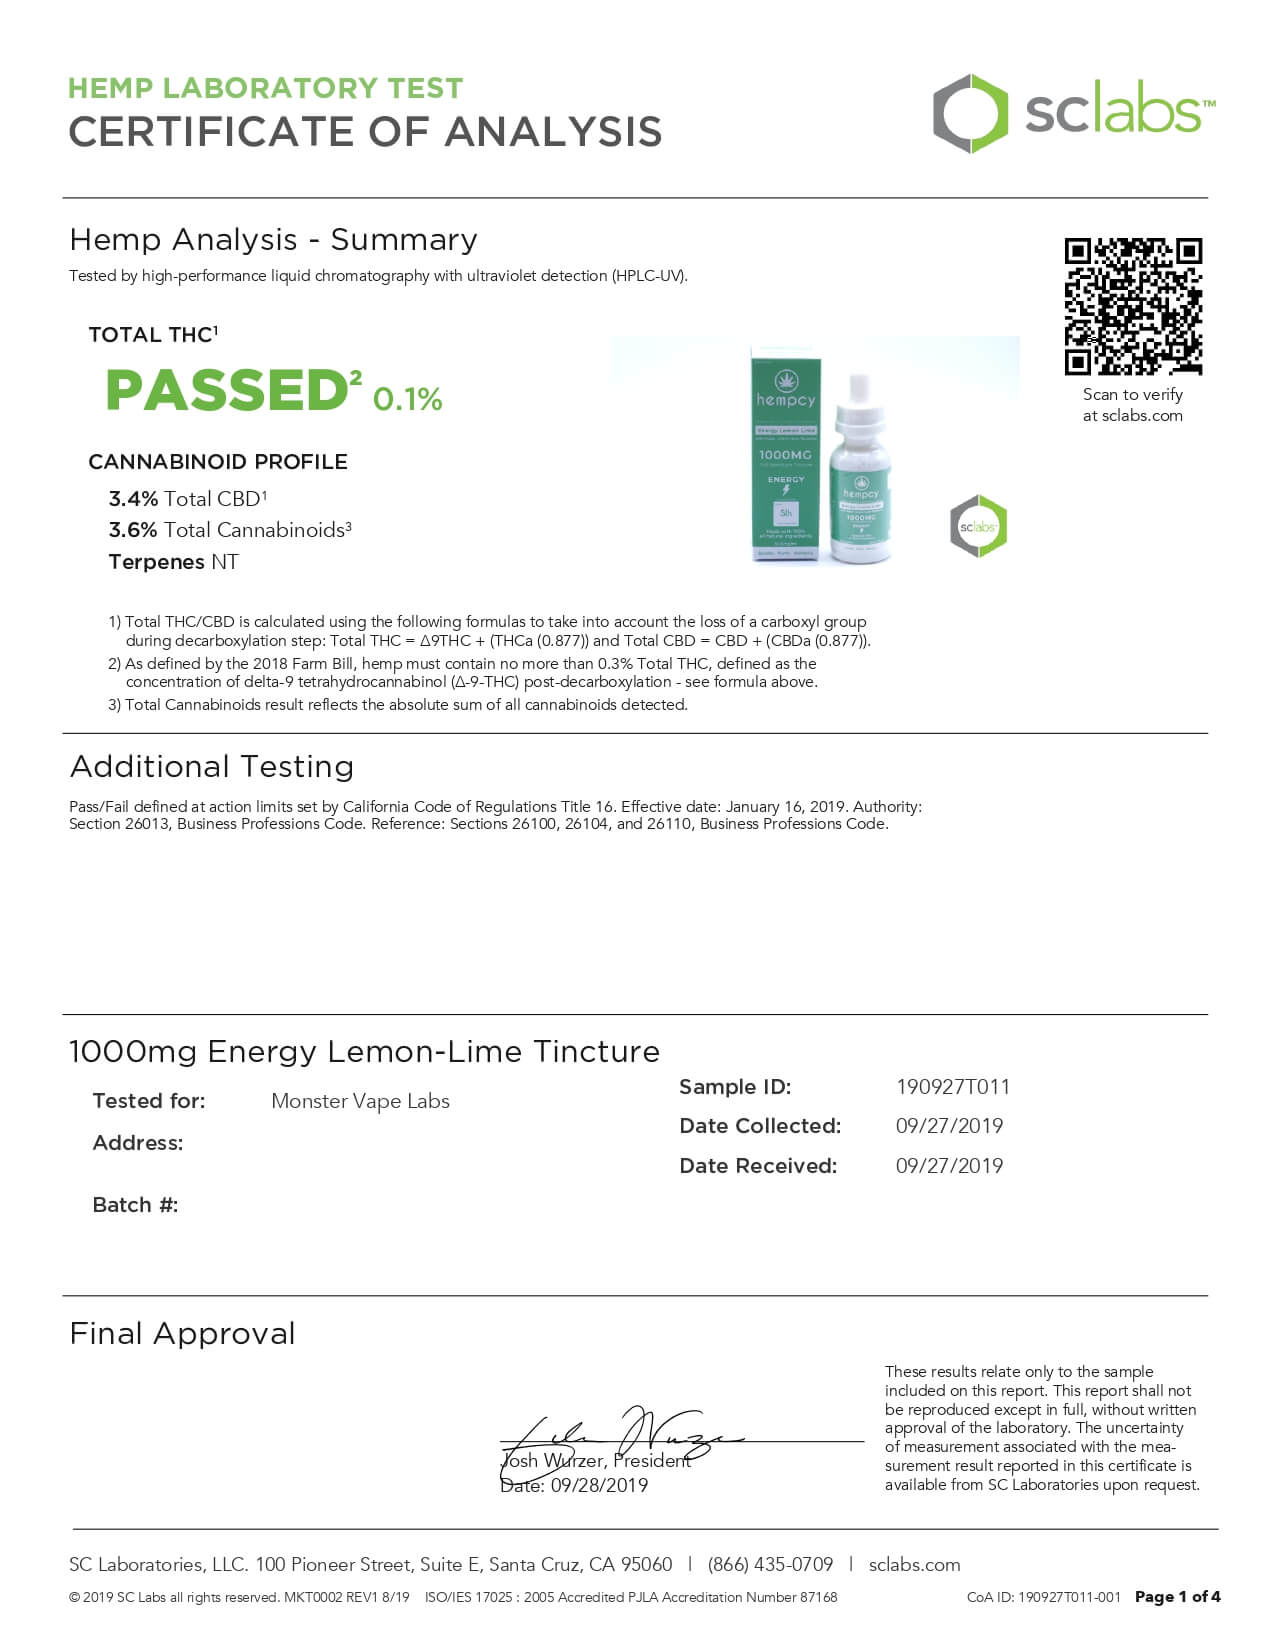 Hempcy CBD Tincture Energy Lemon Lime 1000mg Lab Report